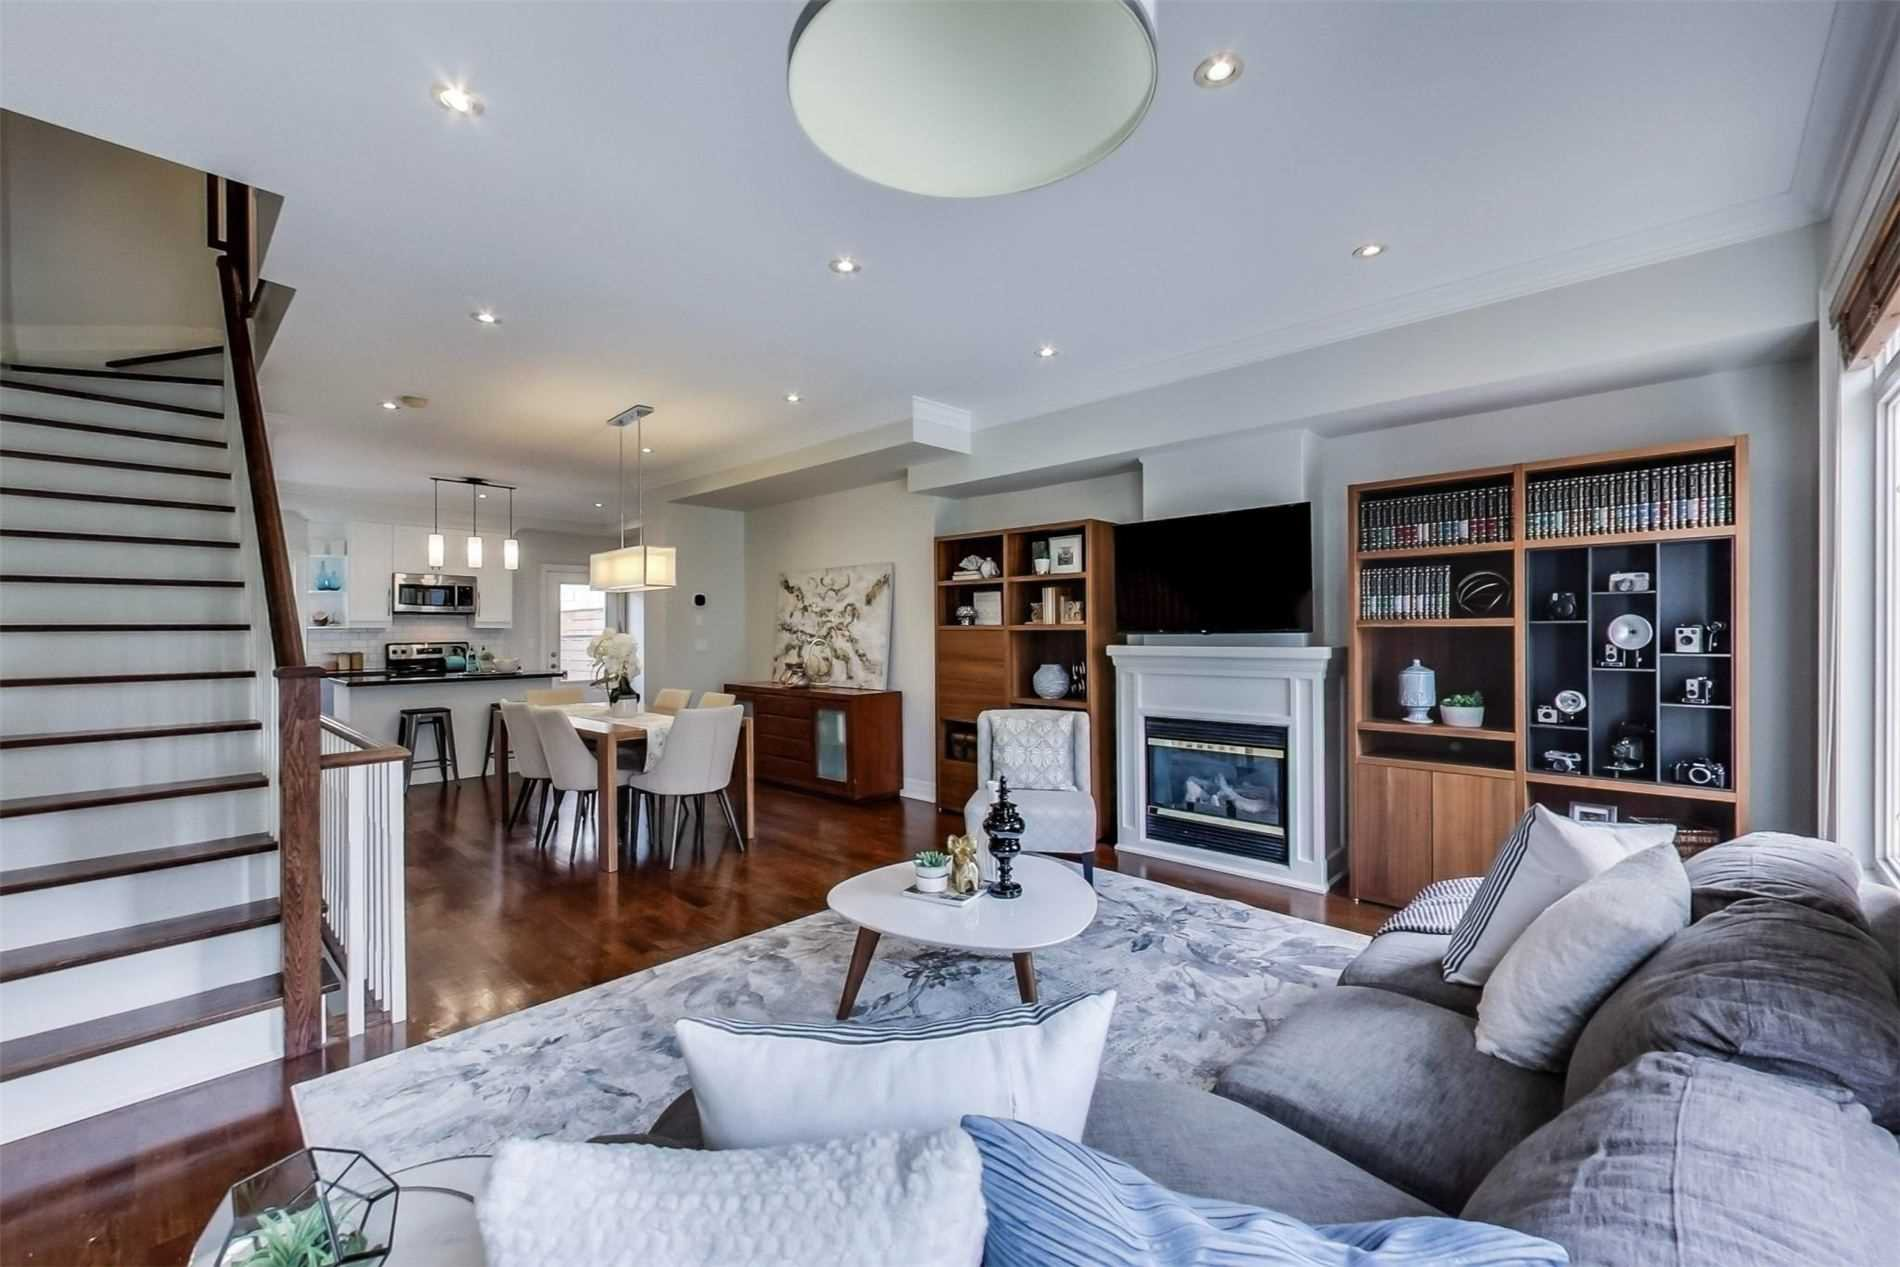 Photo 6: Photos: 213 Heward Avenue in Toronto: South Riverdale House (3-Storey) for sale (Toronto E01)  : MLS®# E4941877